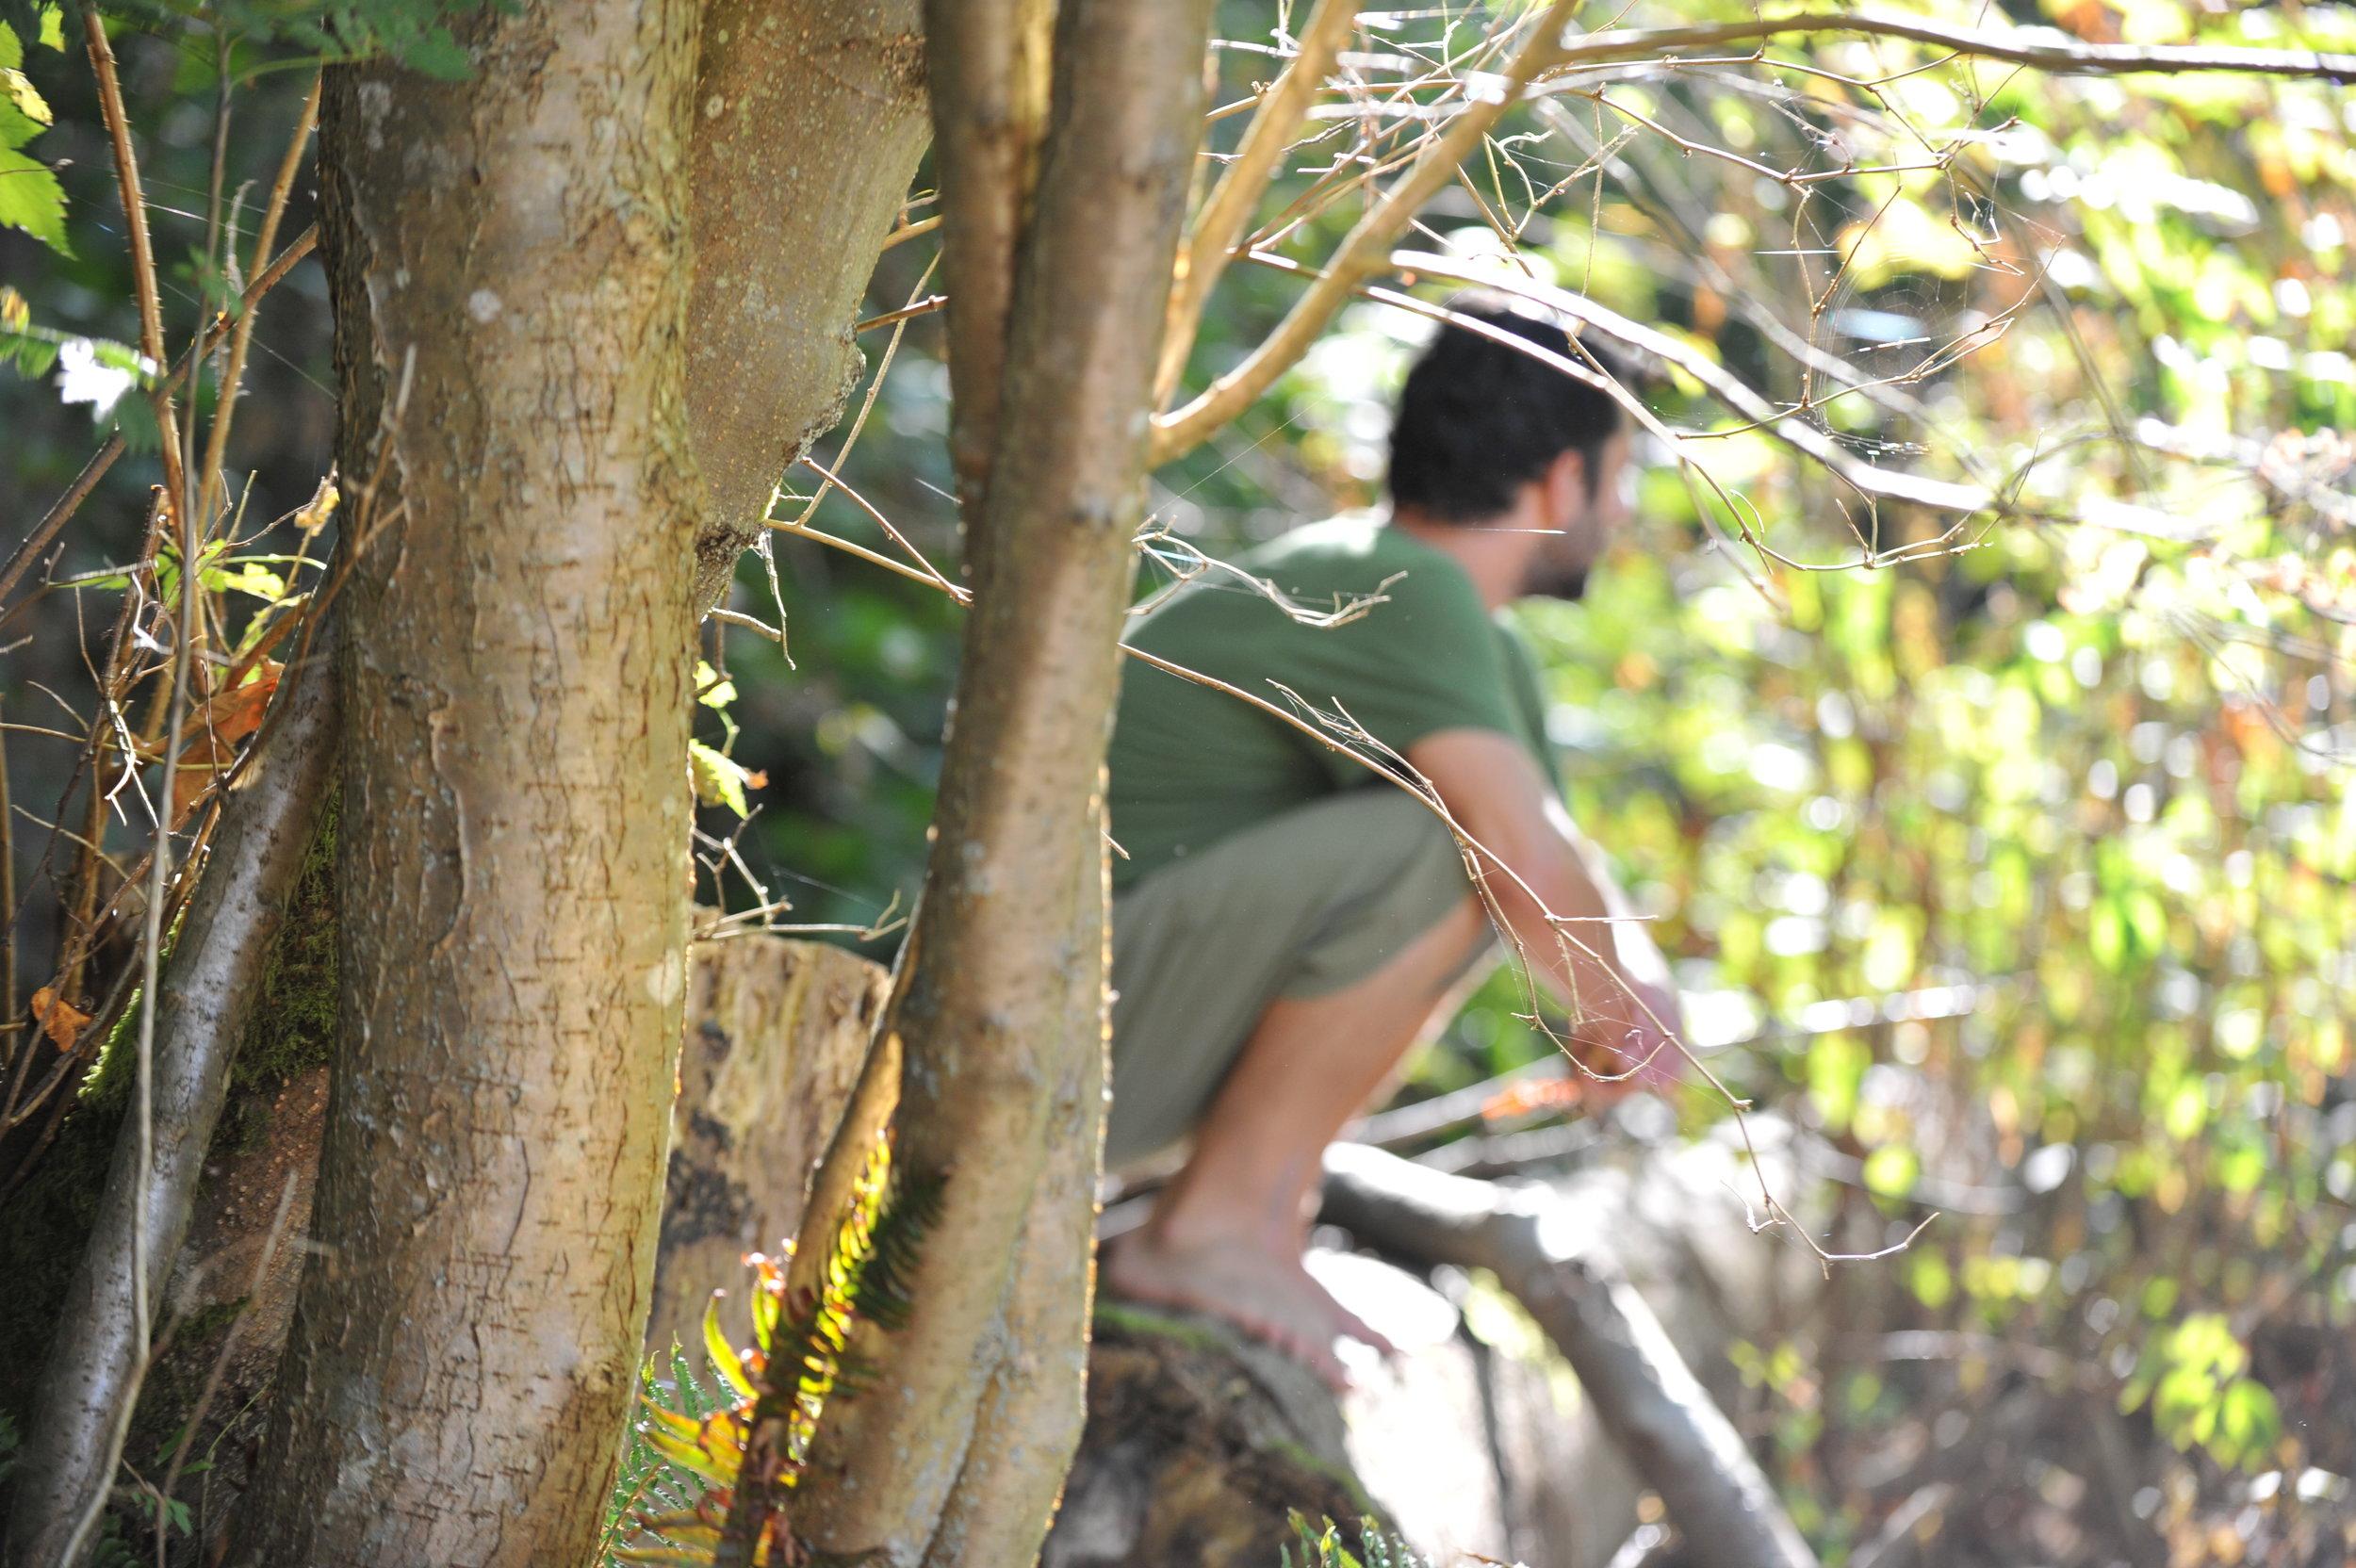 man-squat-tree-outdoors.JPG